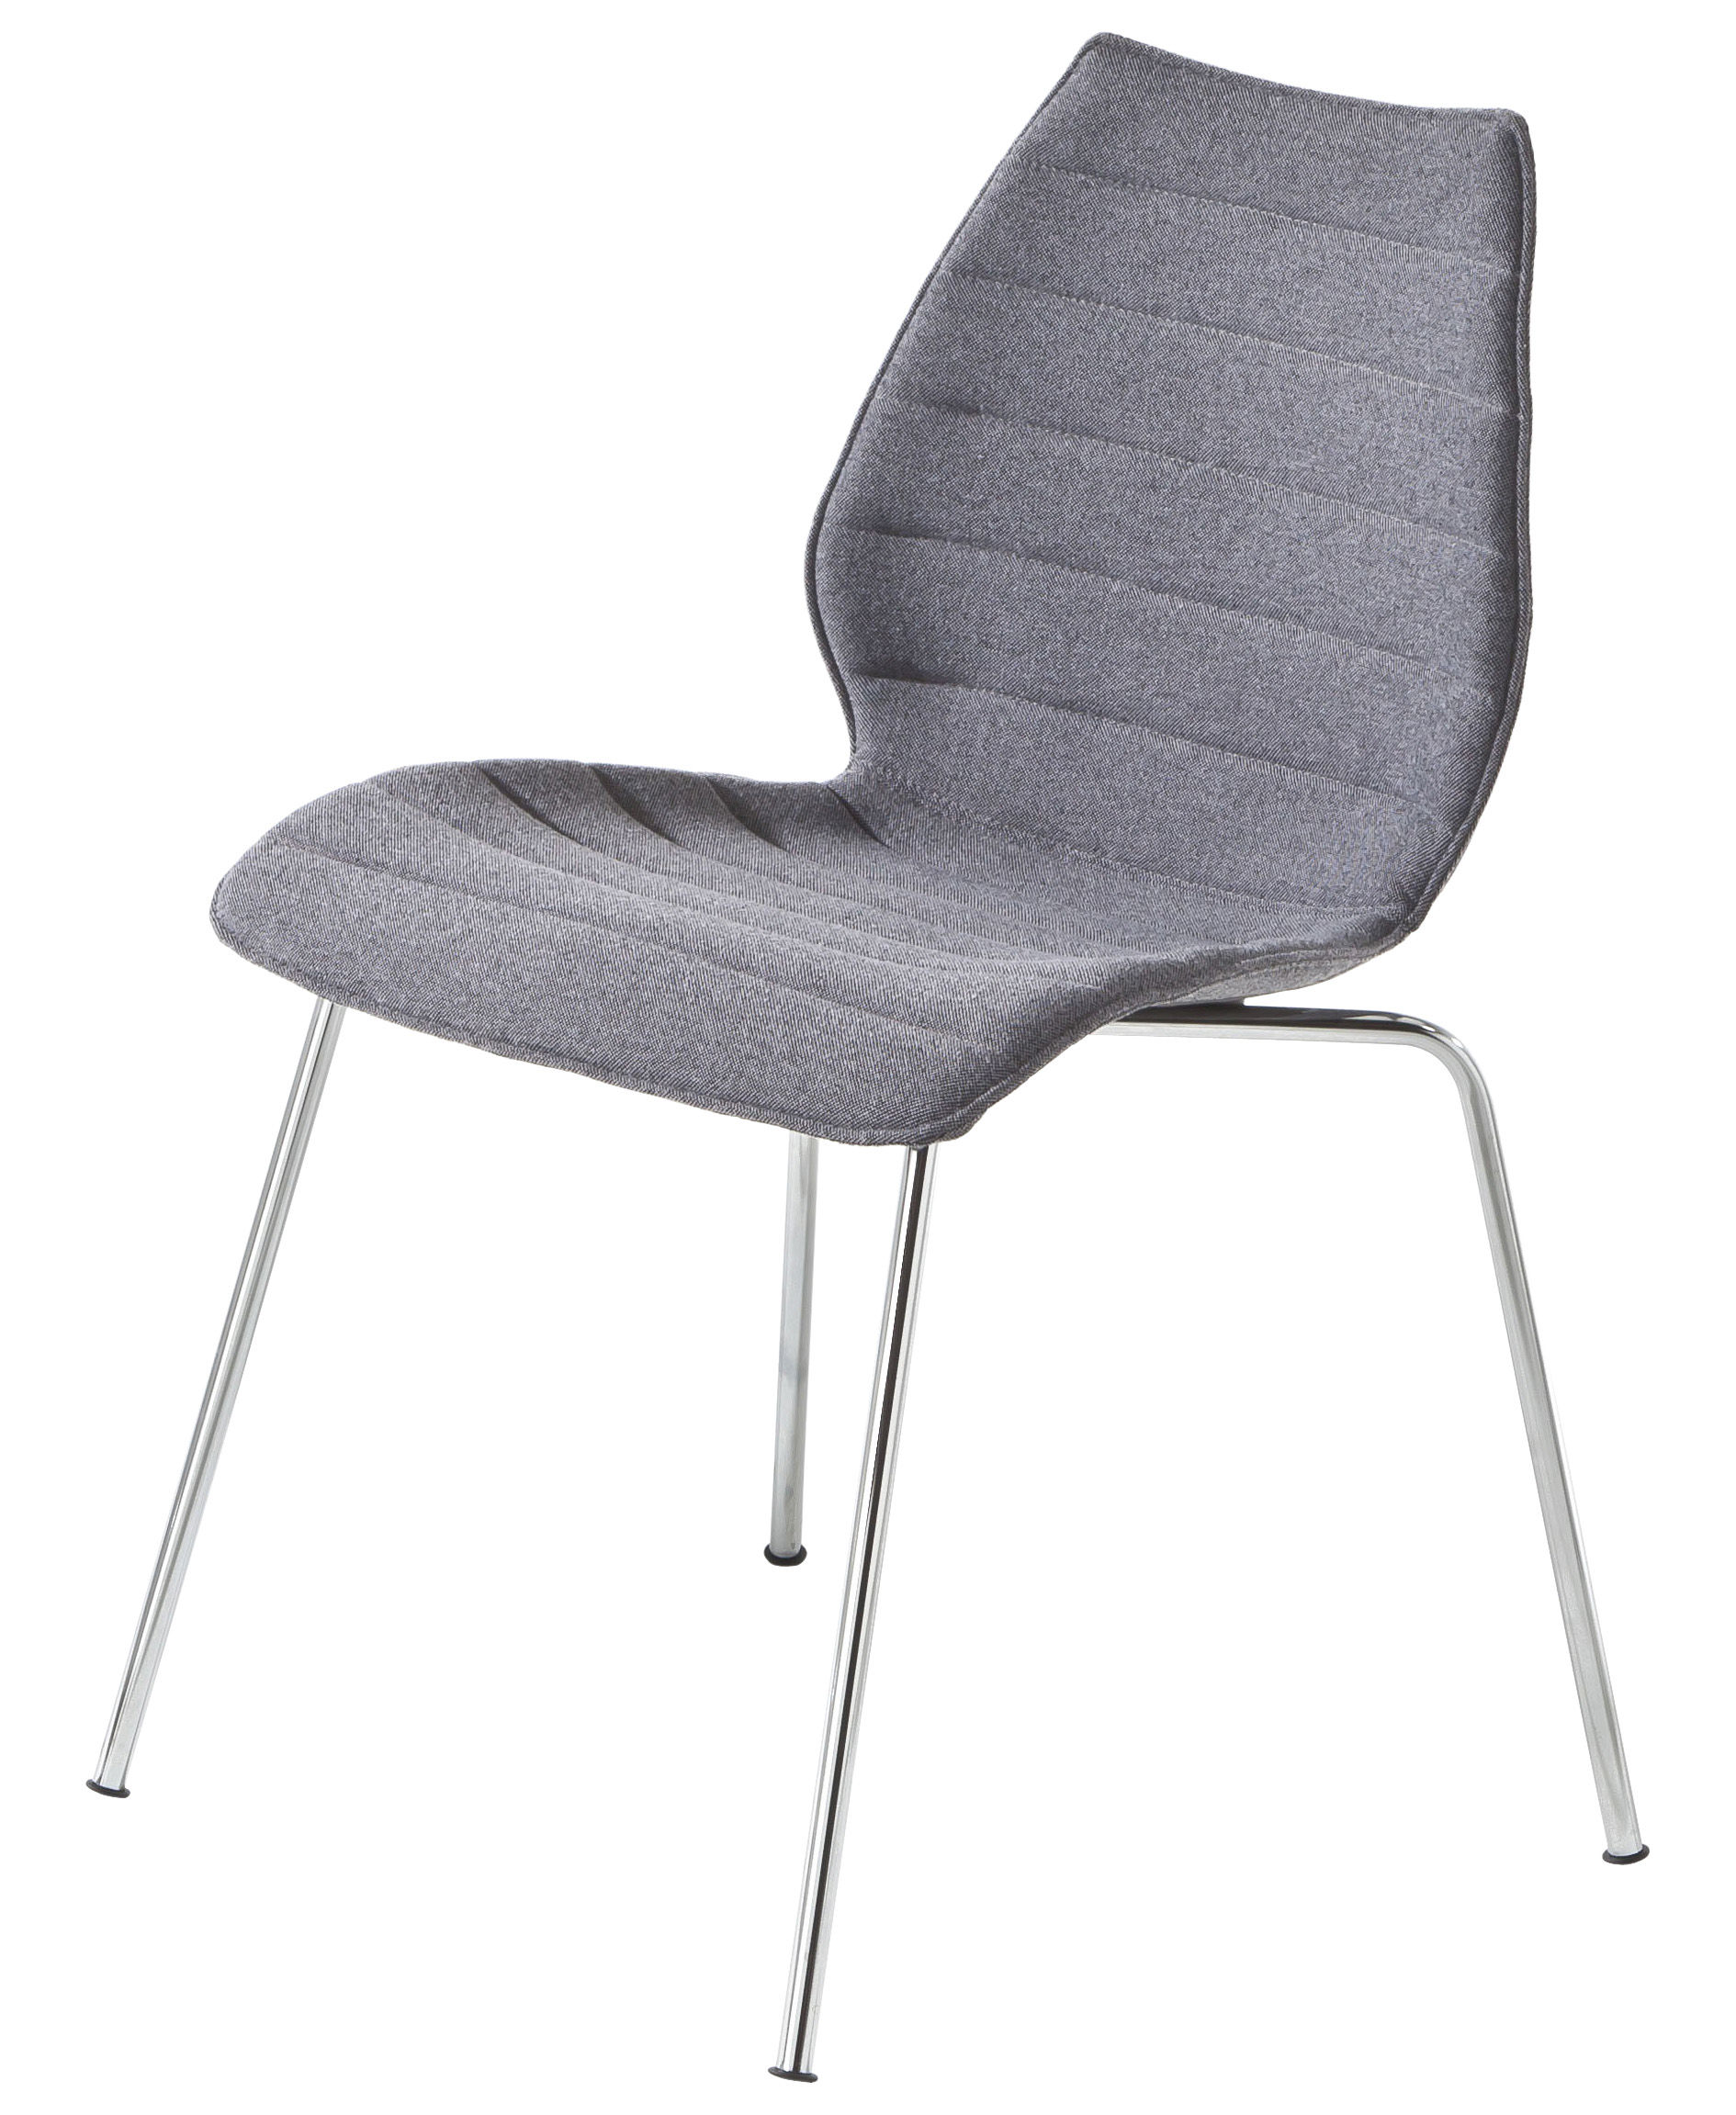 chaise rembourr e maui soft tissu trevira gris kartell. Black Bedroom Furniture Sets. Home Design Ideas